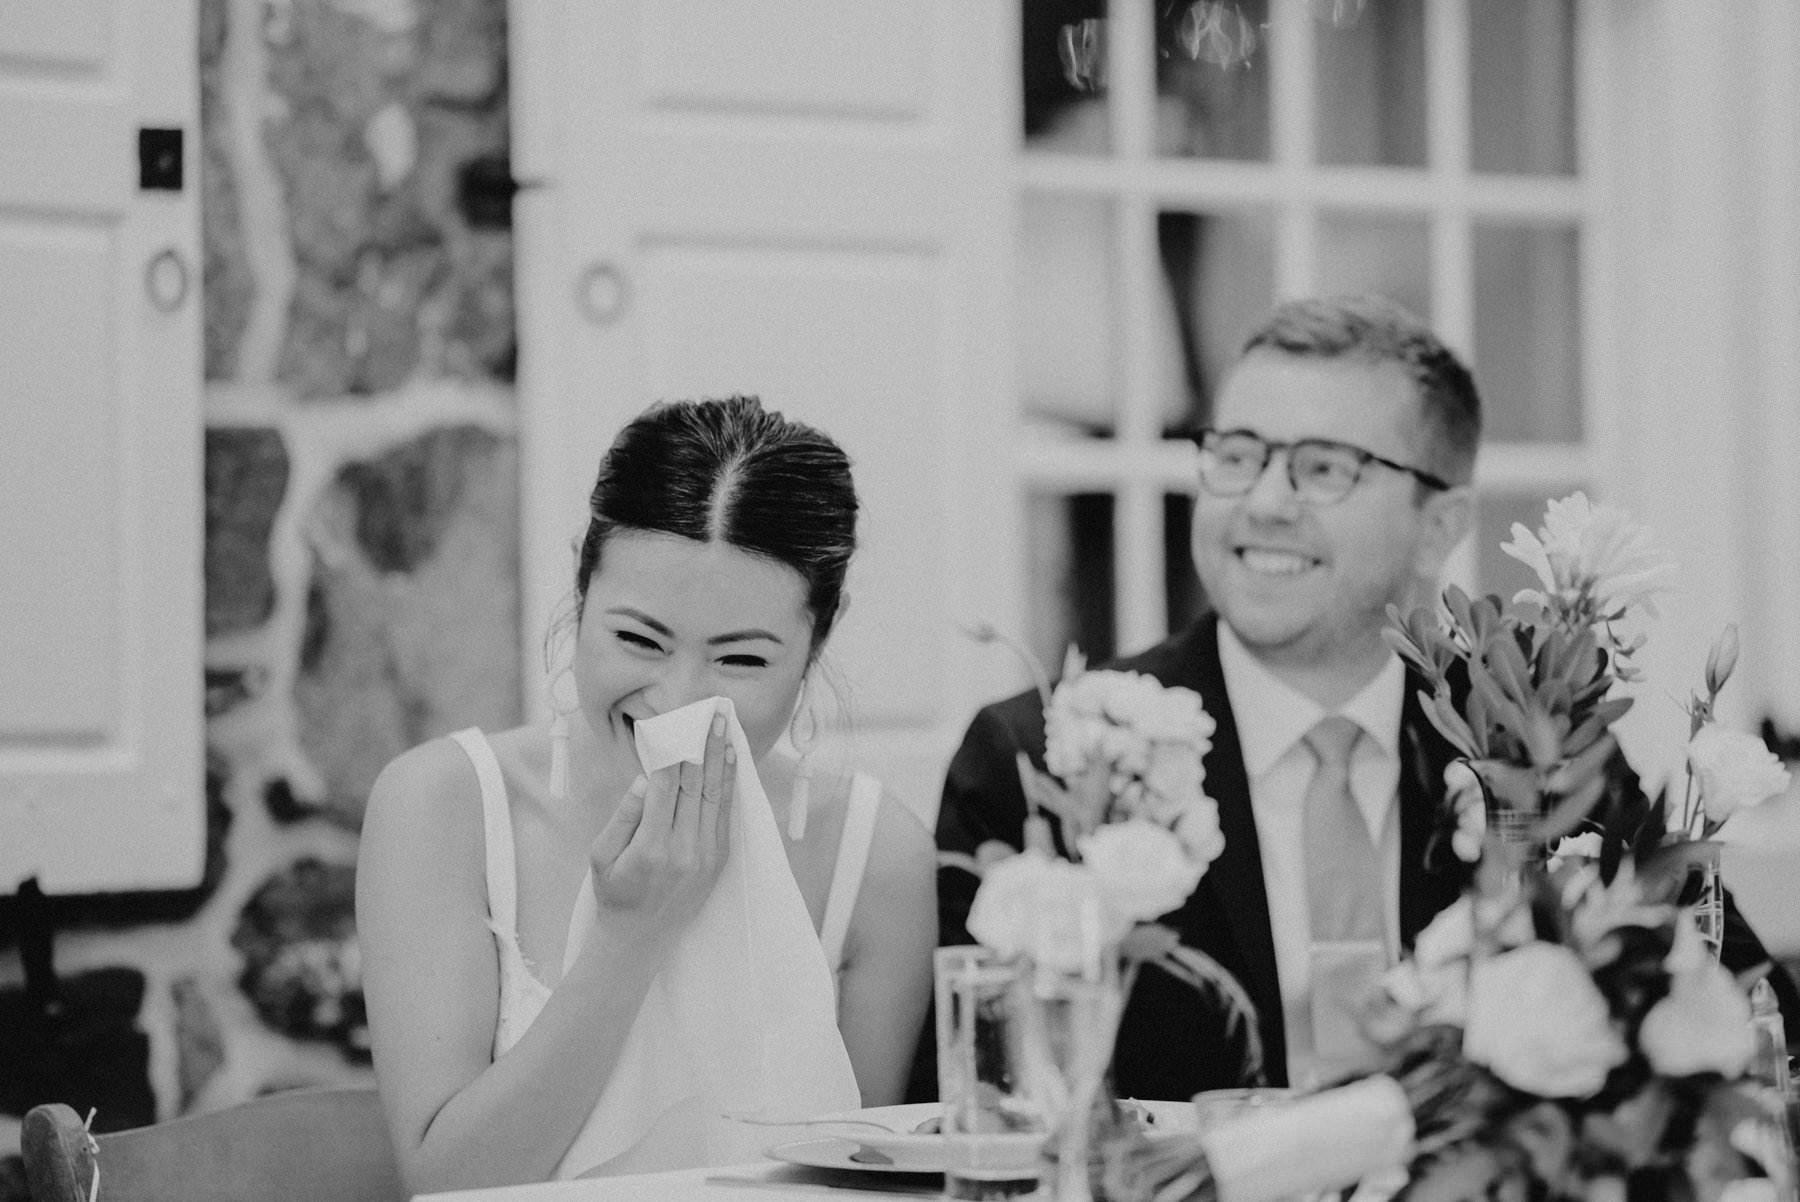 Appleford-estate-wedding-122.jpg